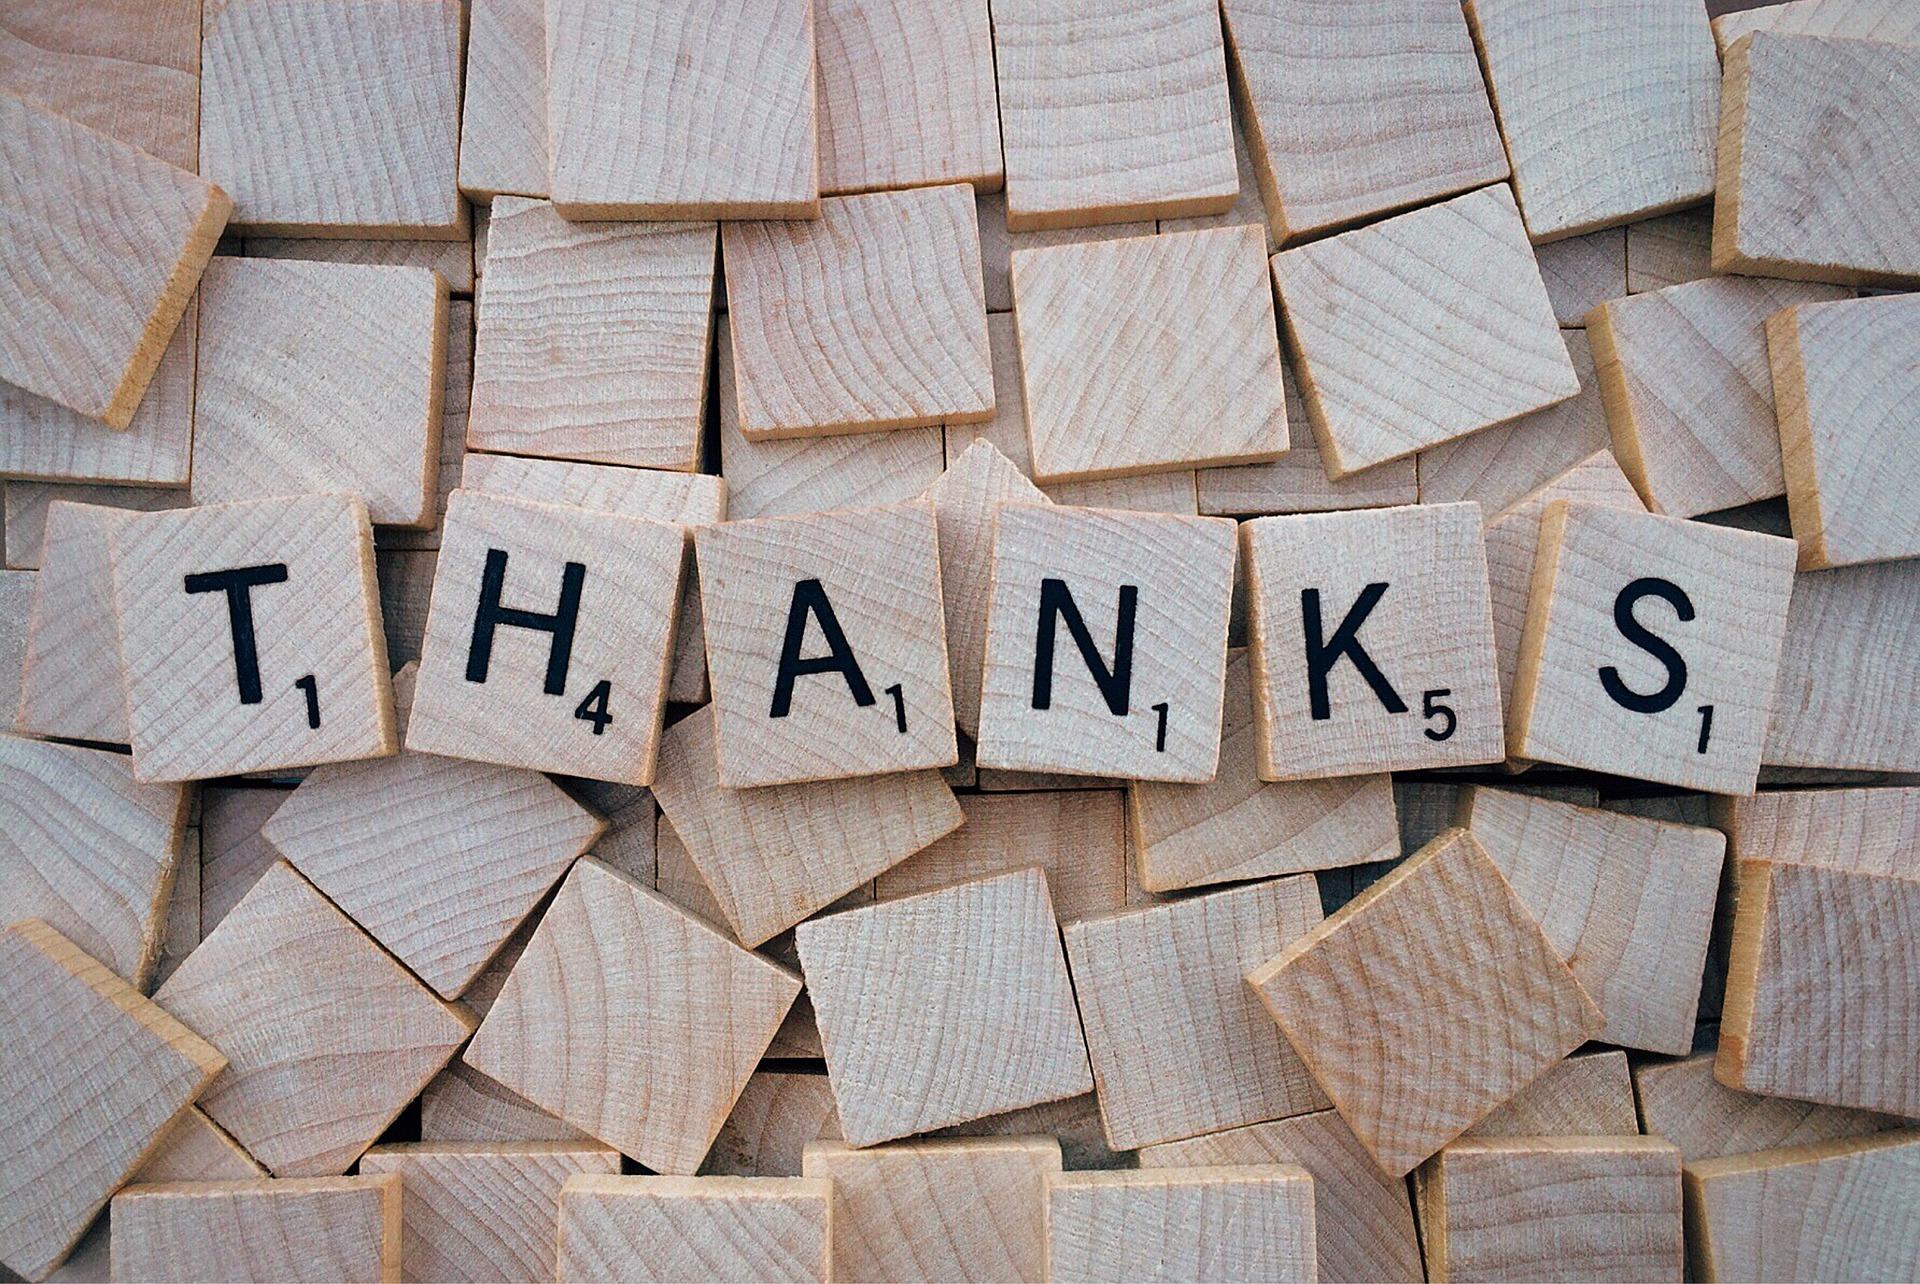 Pixabay - thanks